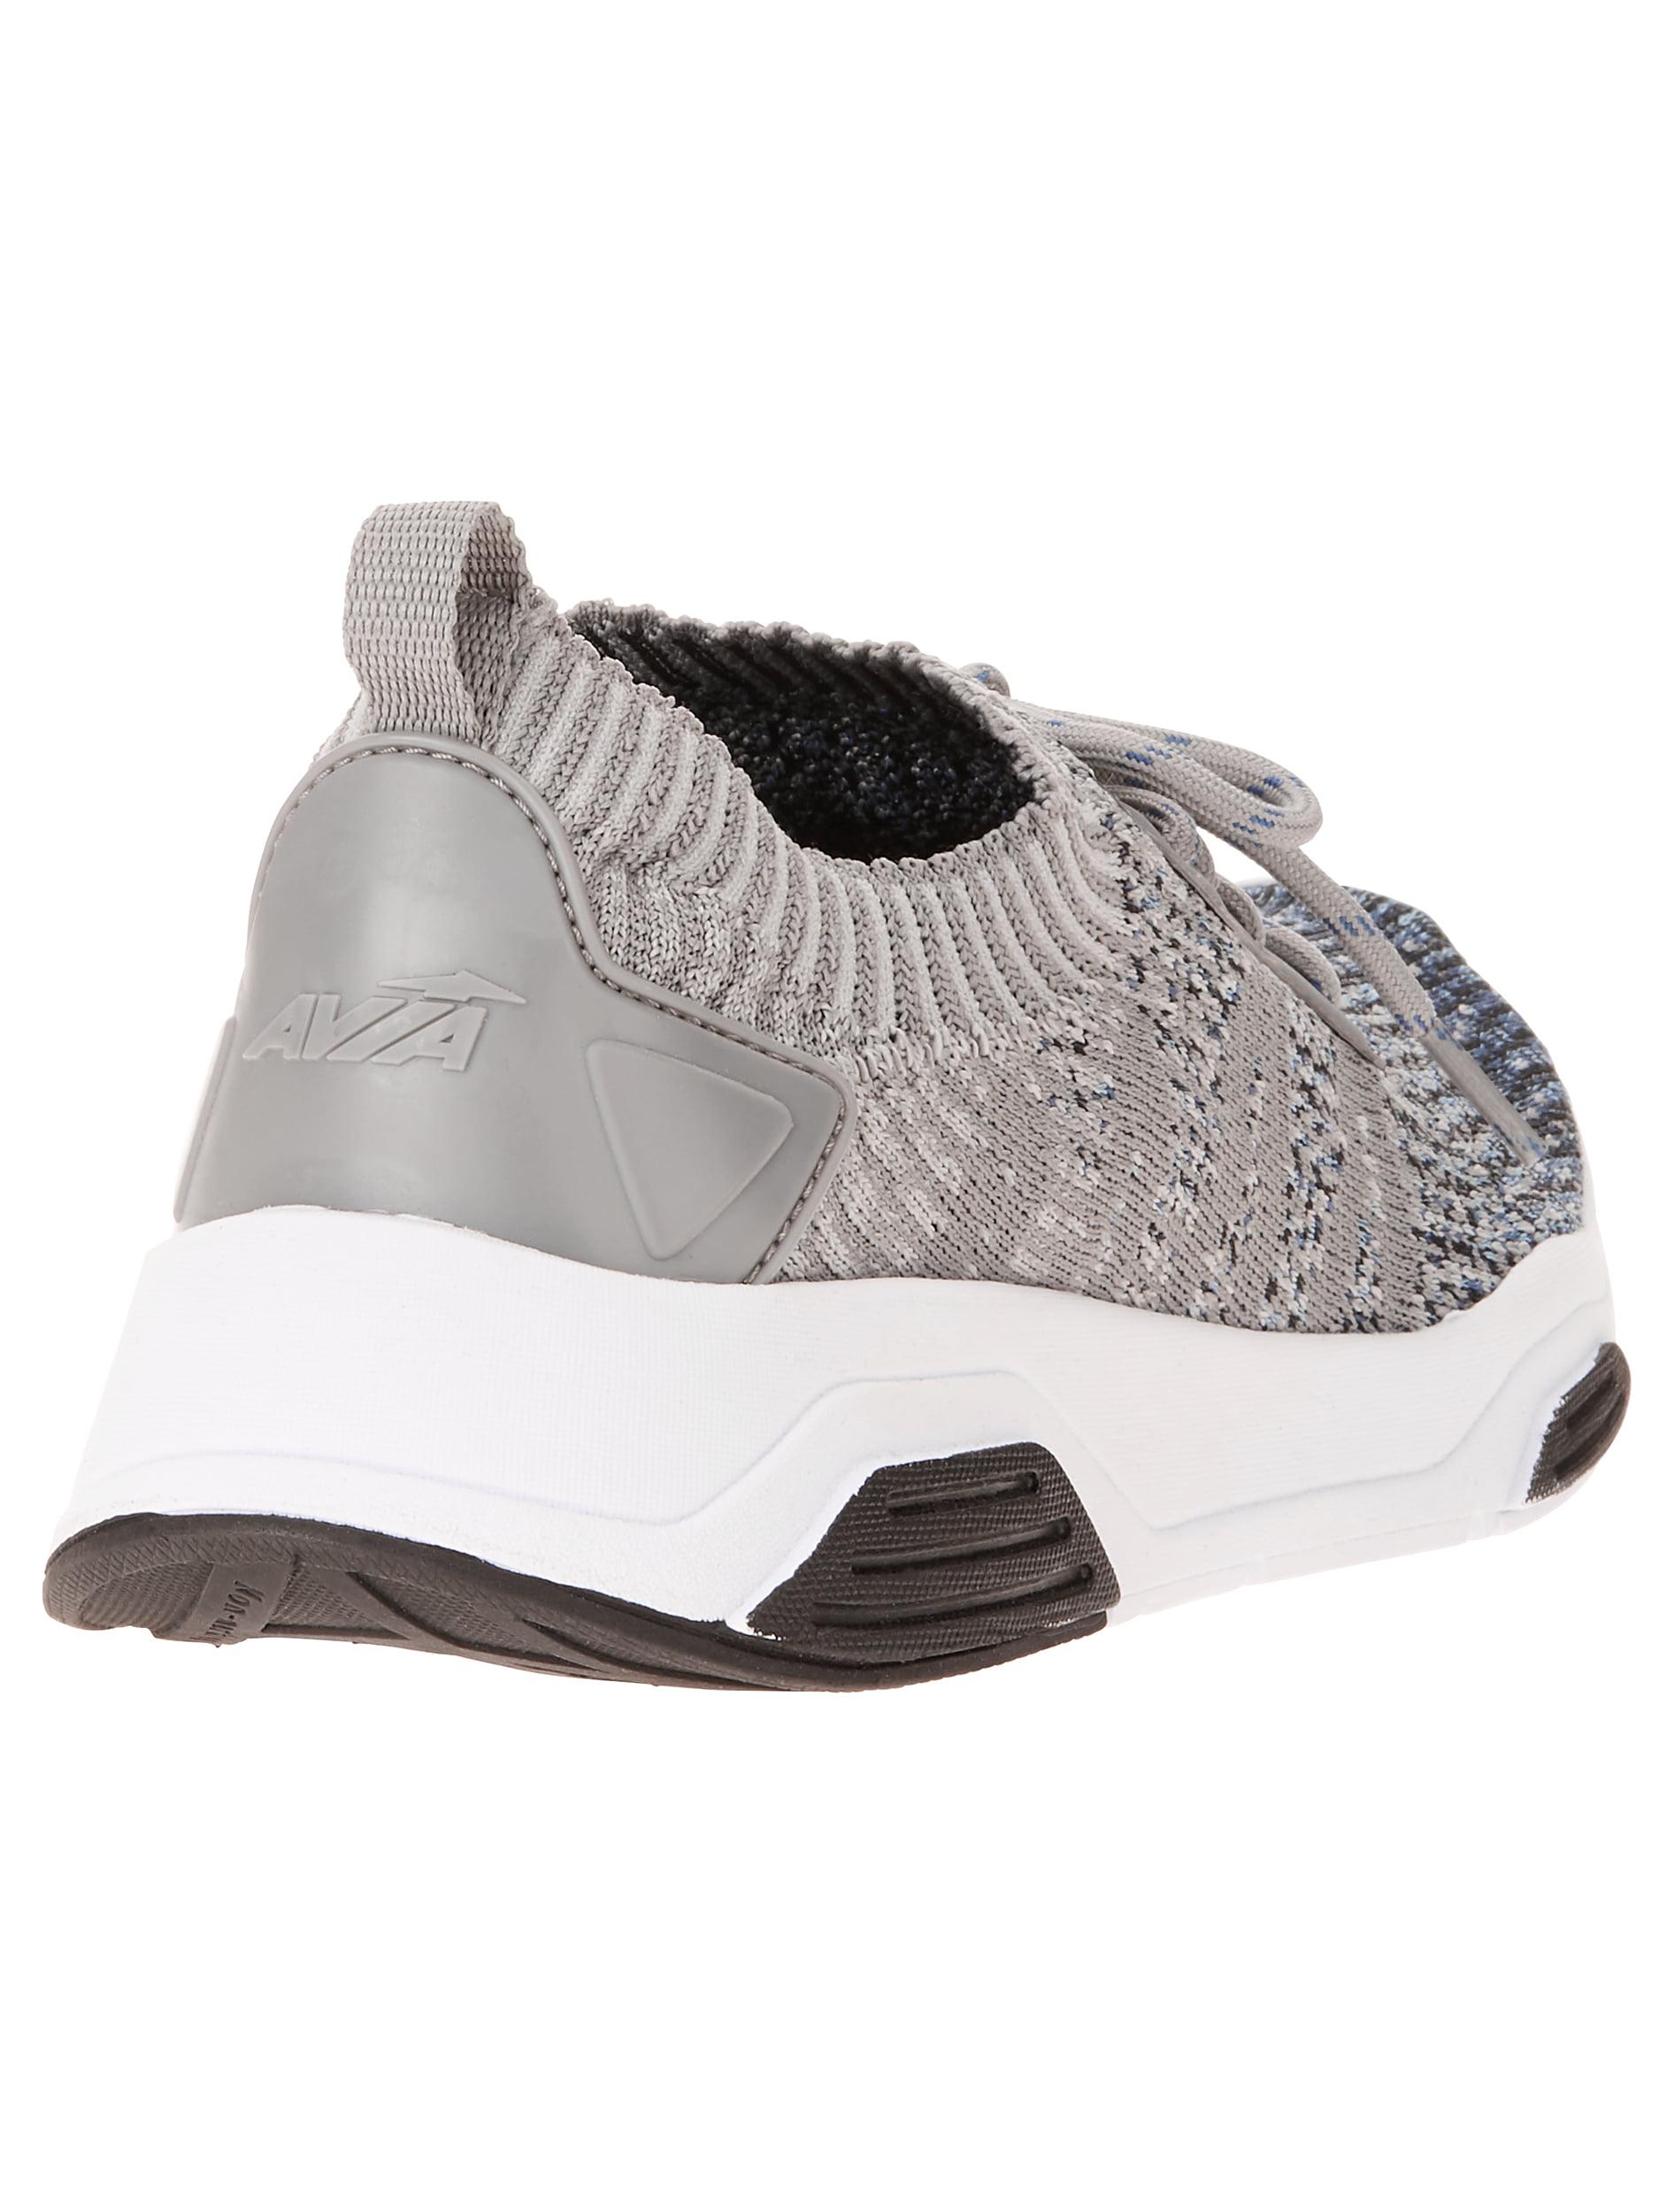 Gradient Athletic Shoe